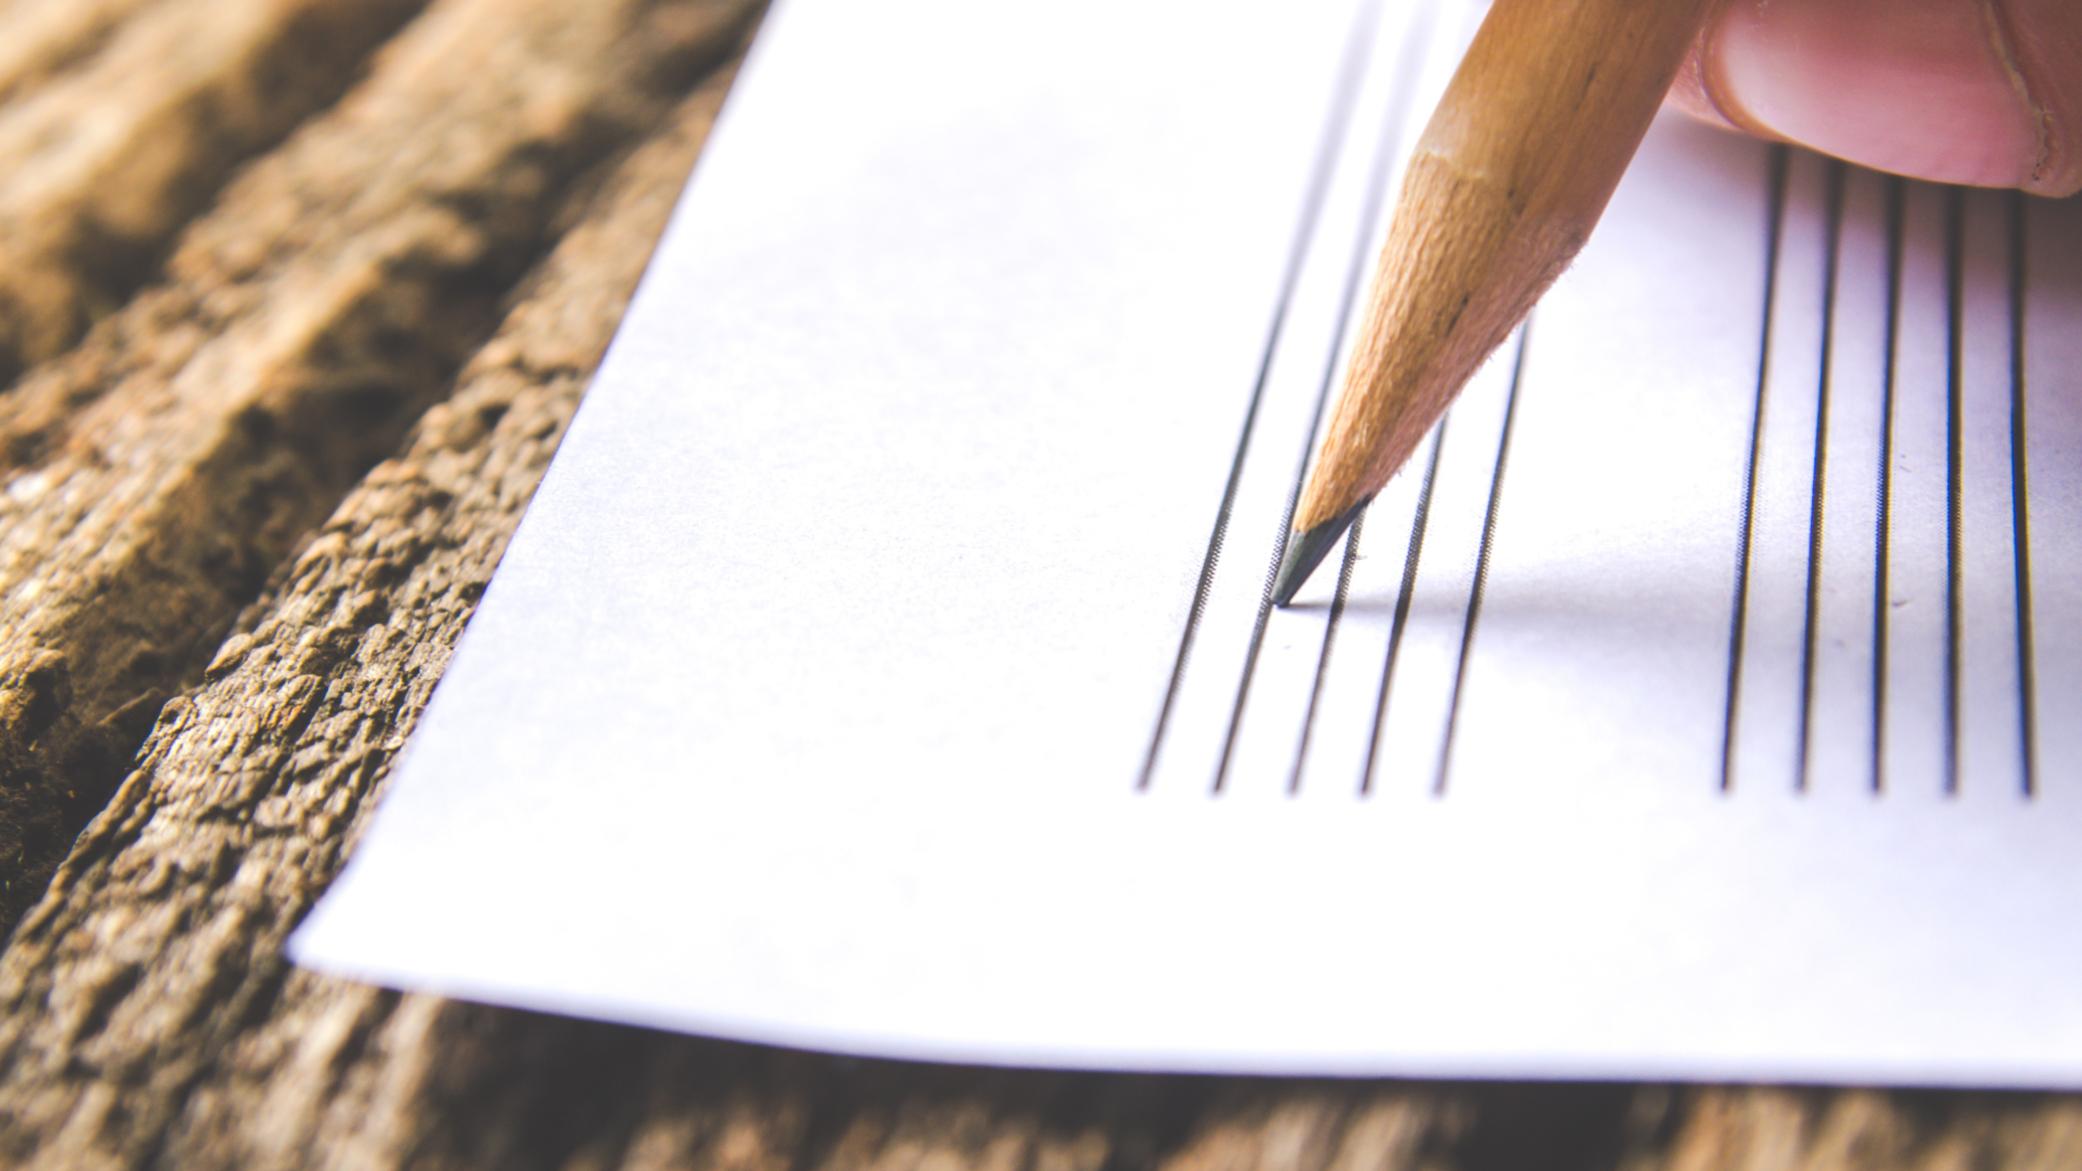 Pencil writing music